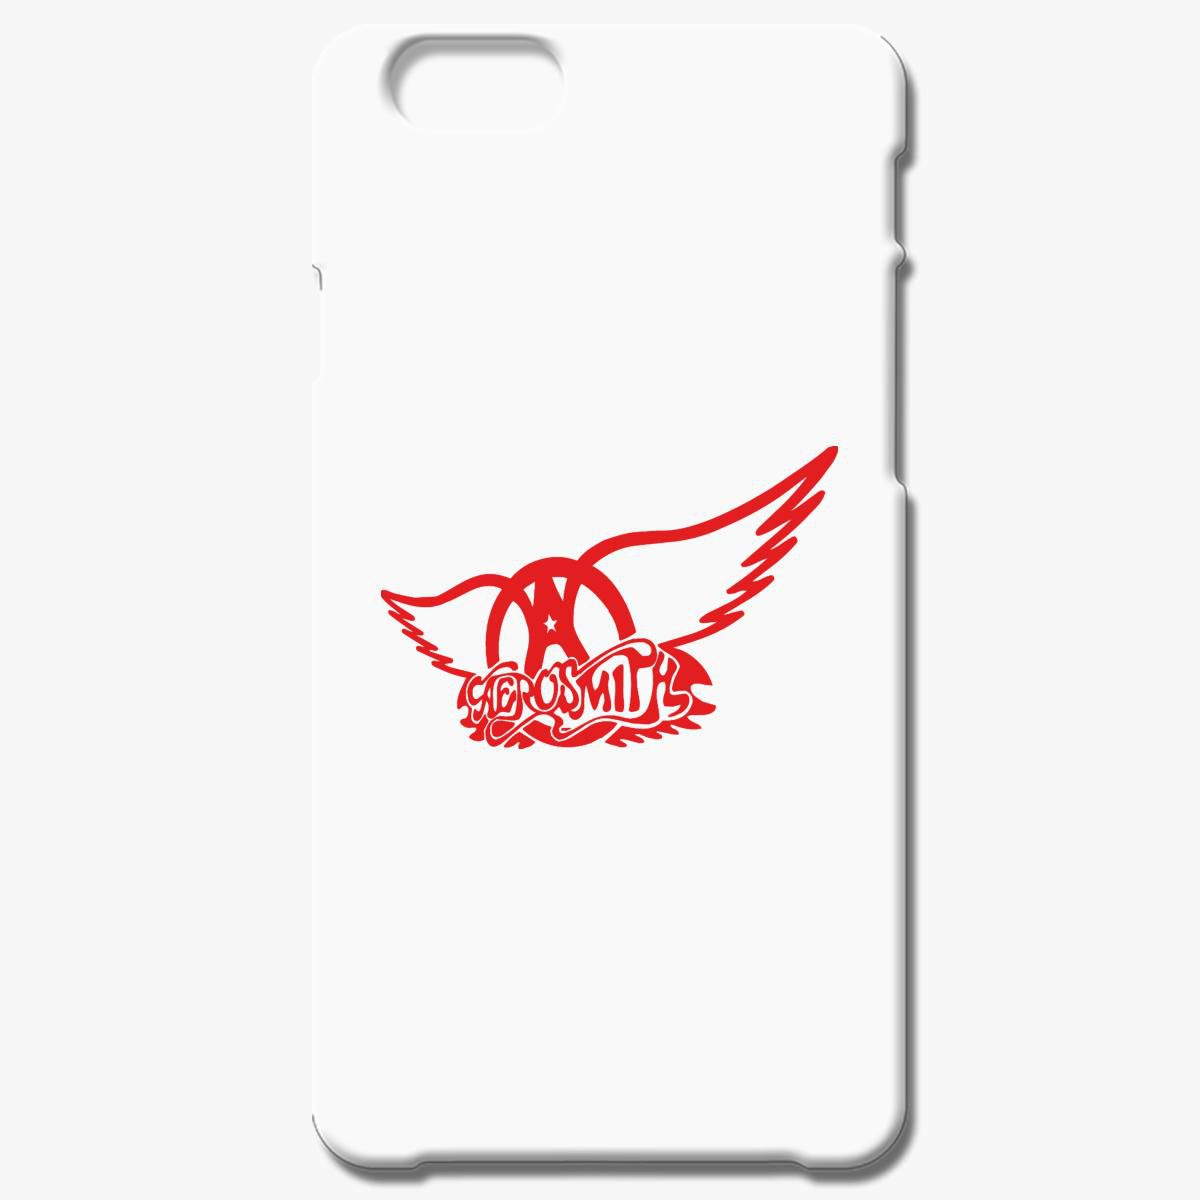 Aerosmith Logo Iphone 6 6s Plus Case